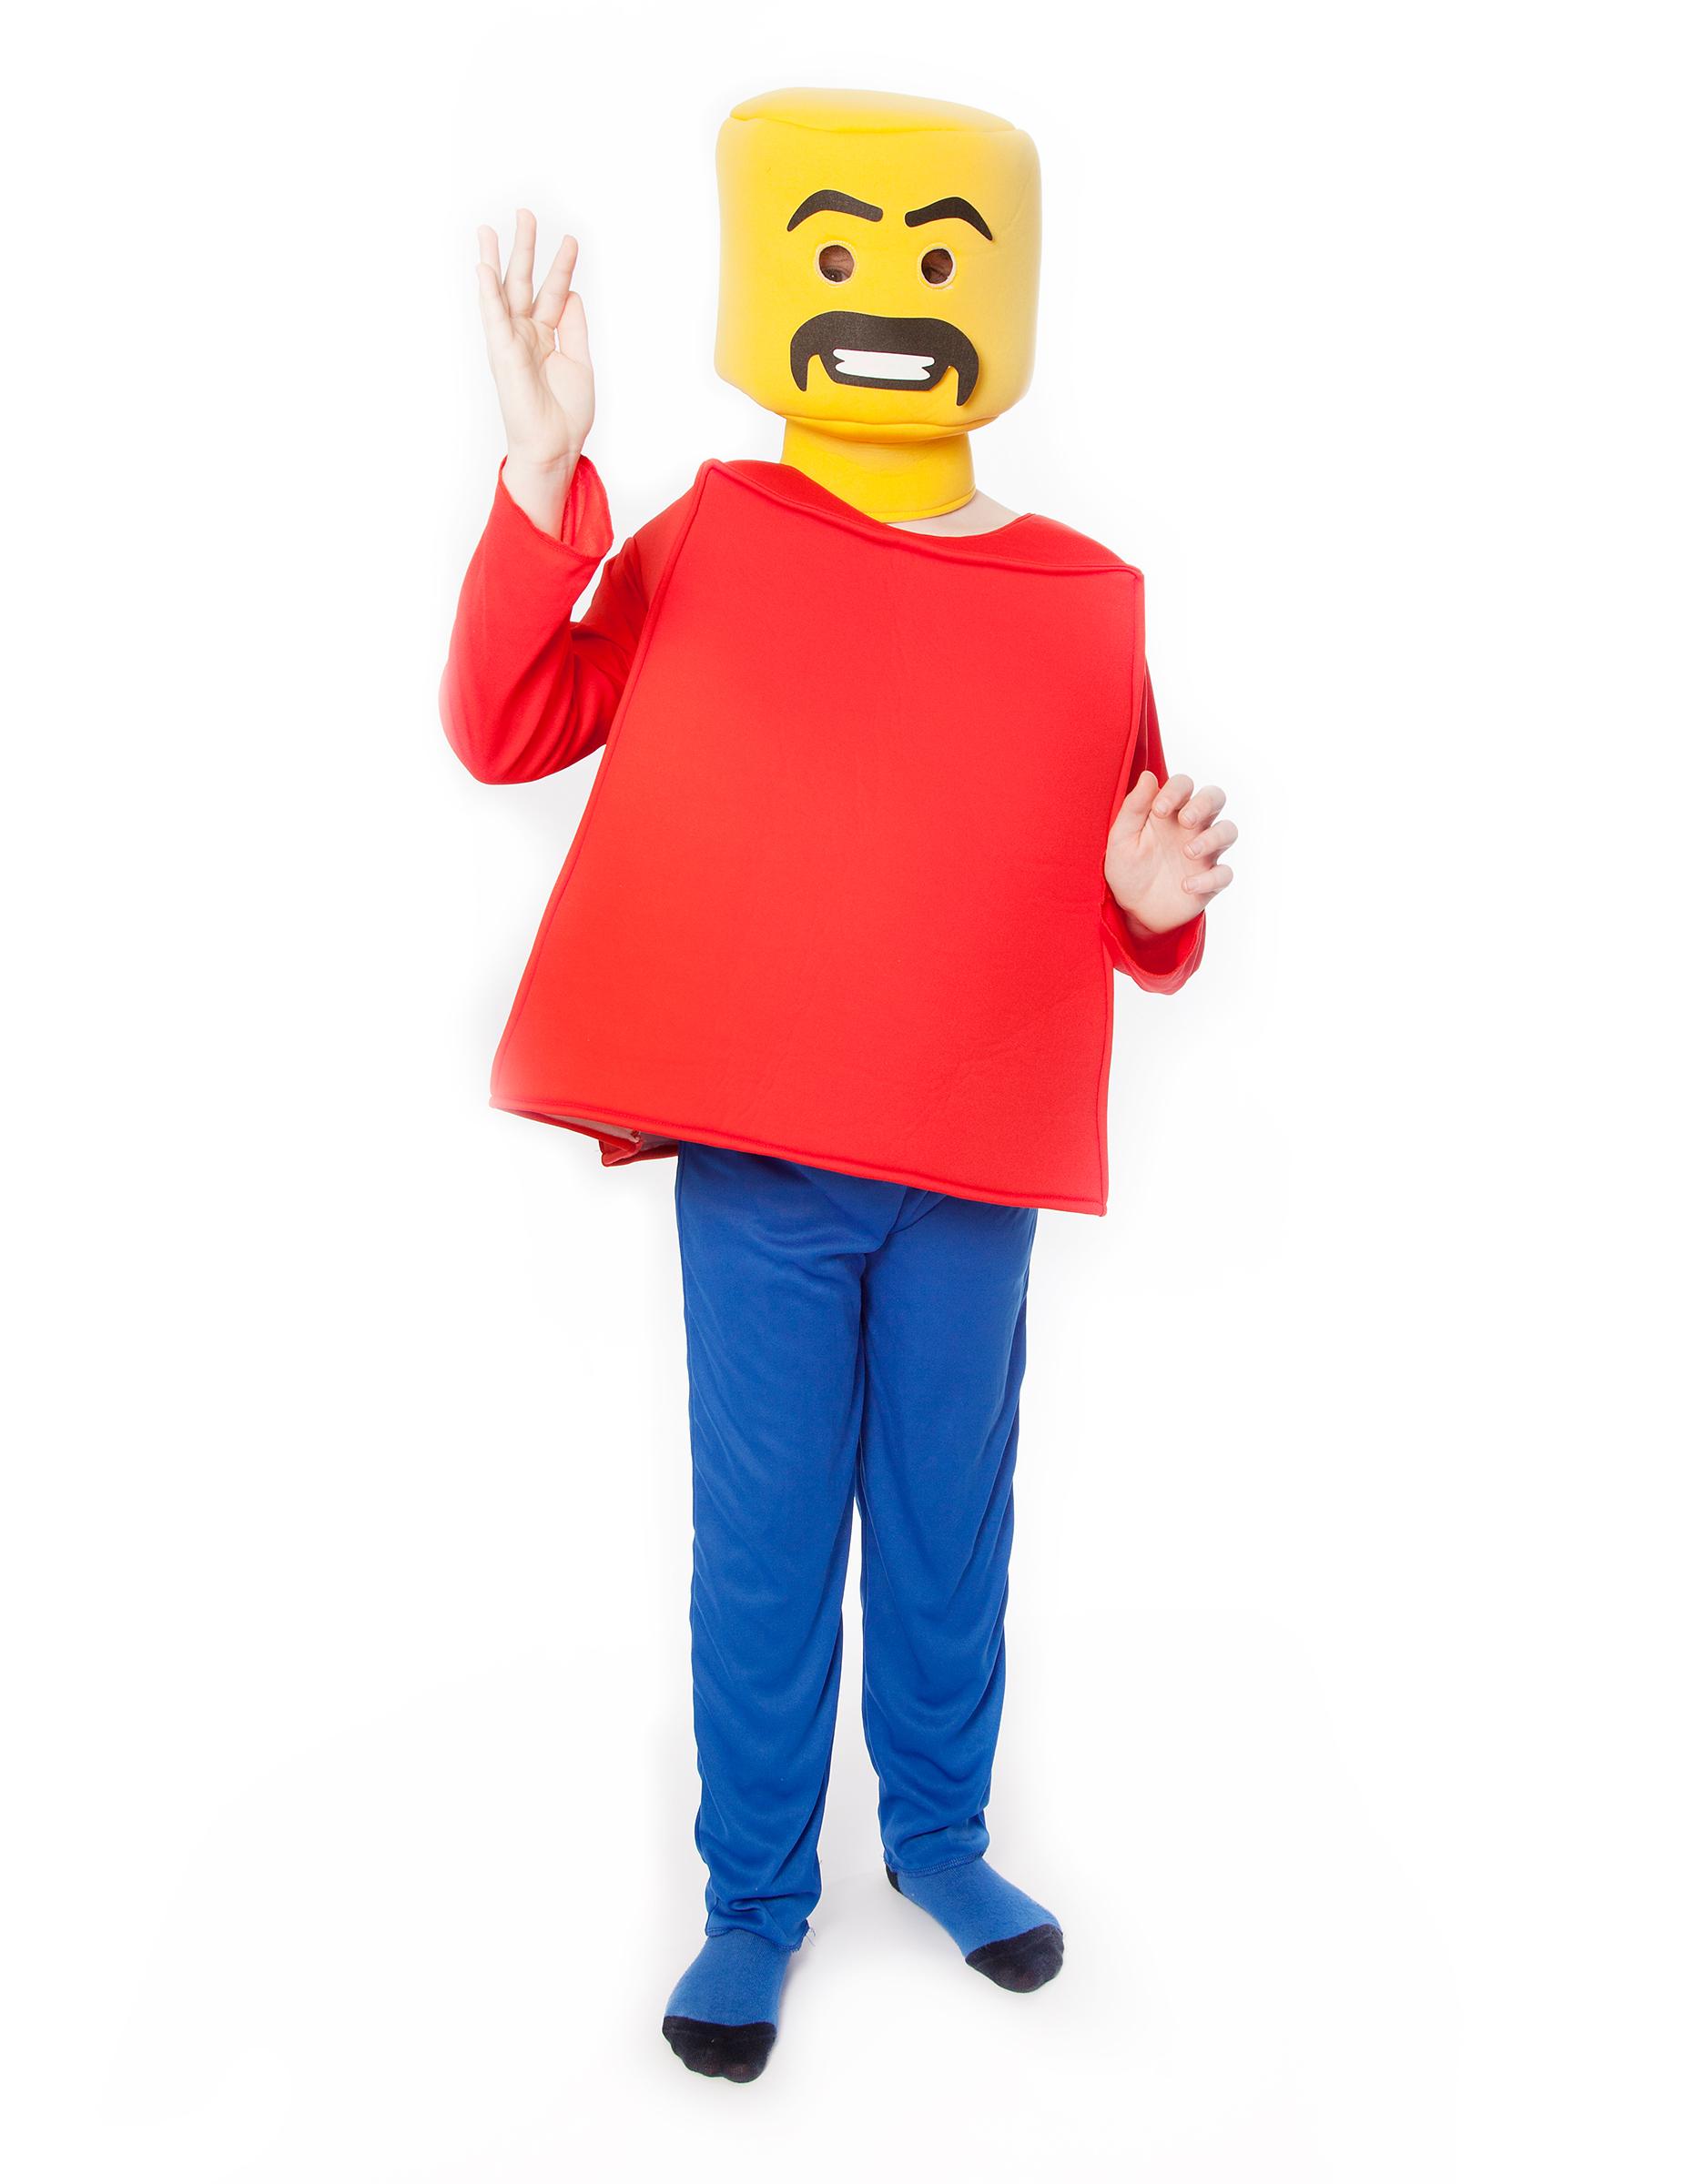 morphsuit spielfigur kinder gelb rot blau g nstige faschings kost me bei karneval megastore. Black Bedroom Furniture Sets. Home Design Ideas